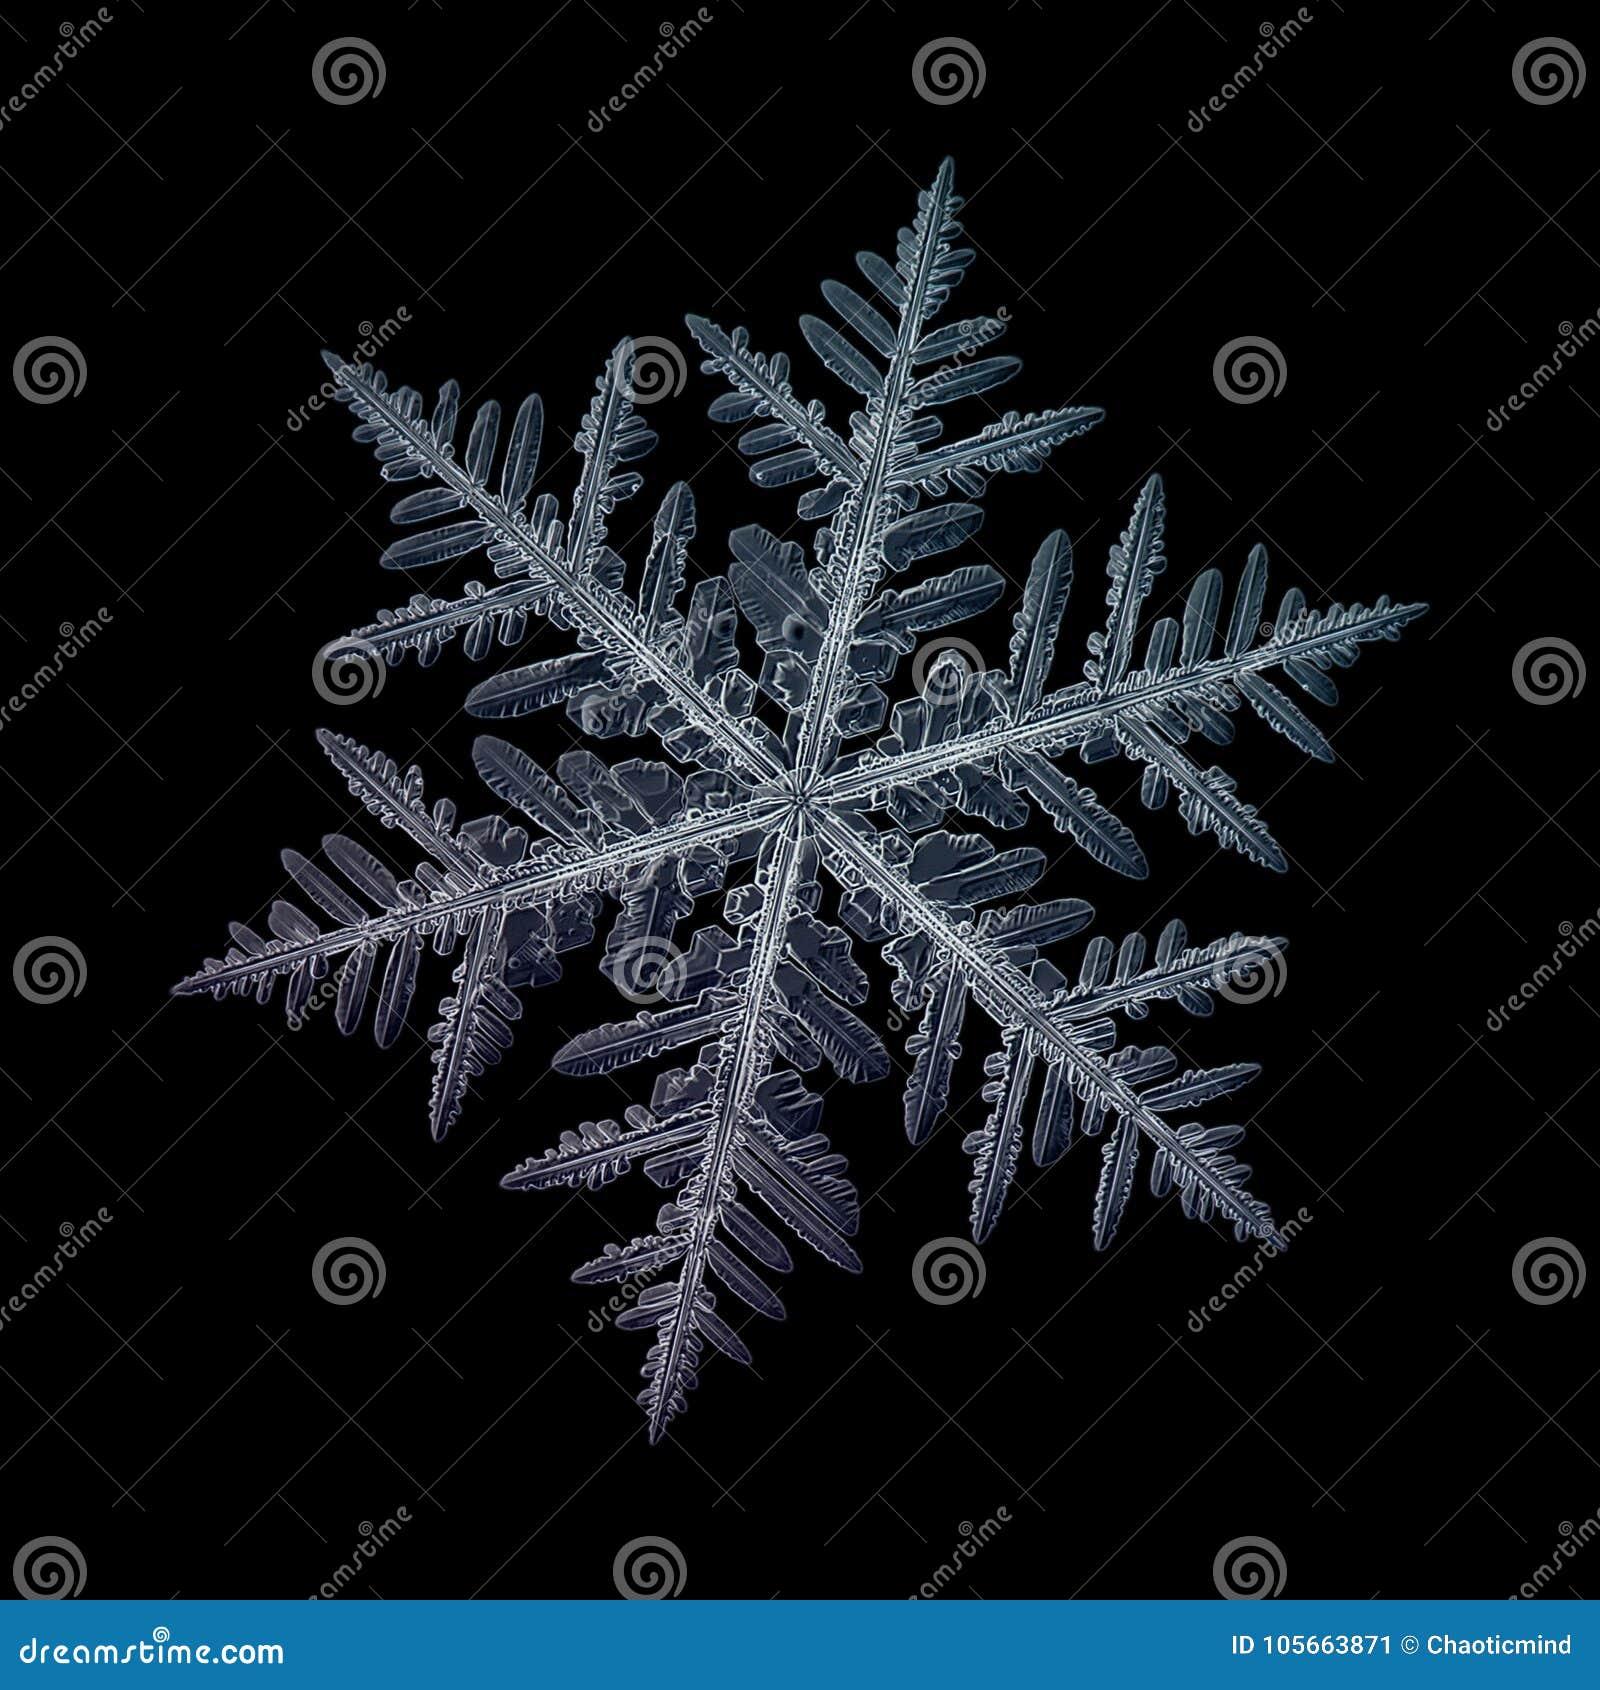 Perfect snowflake - cold winter season |Real Snowflakes Background